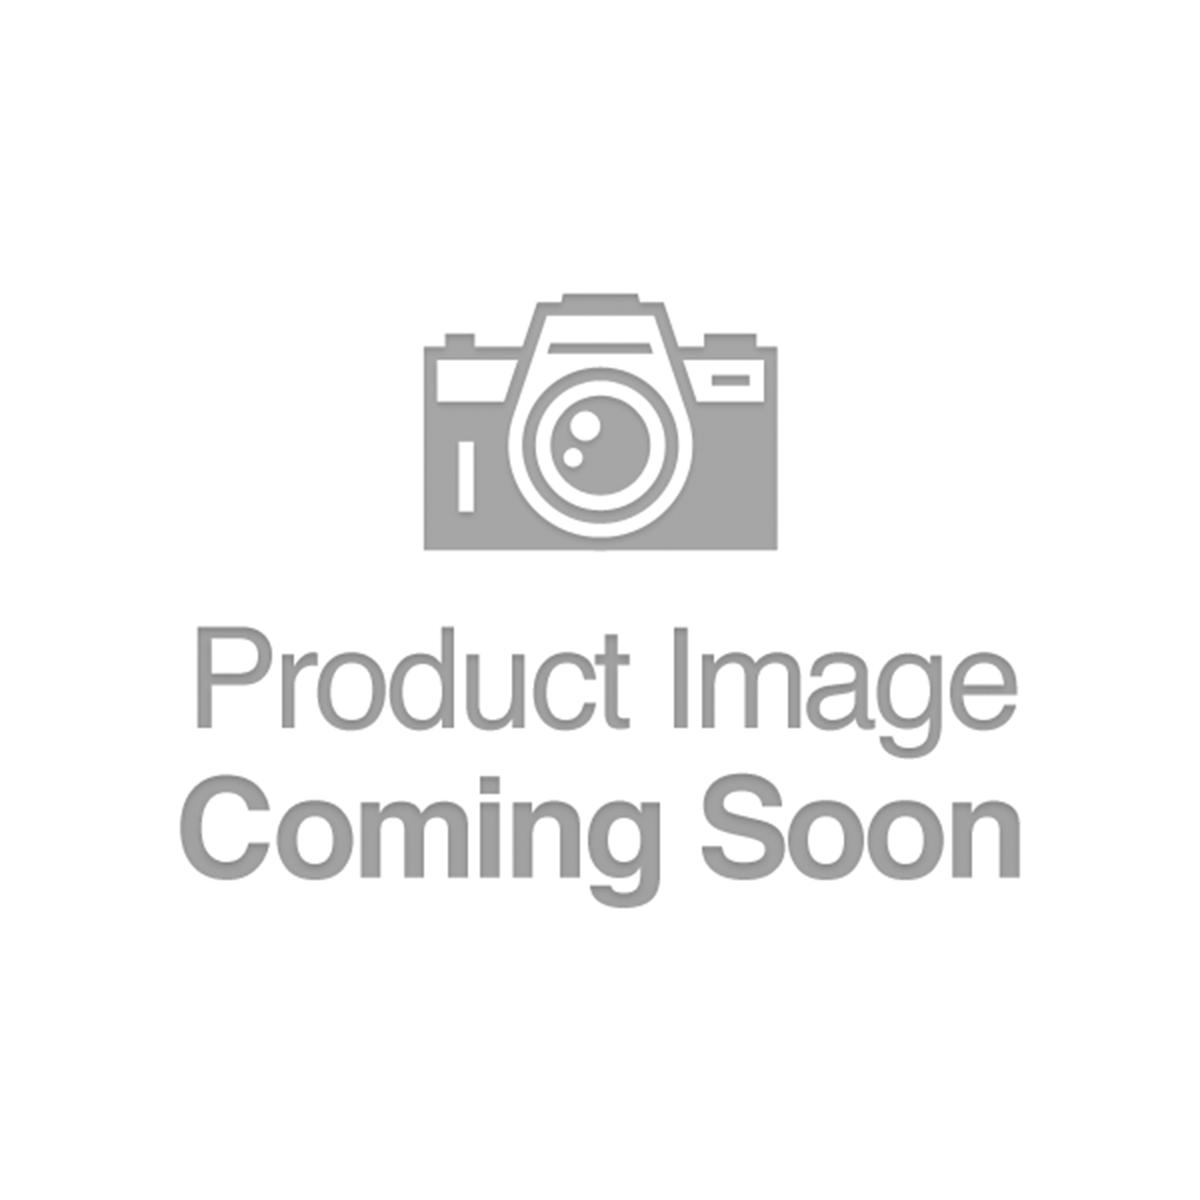 Carrollton - Illinois - CH 2390 - FR 404 - PMG 63 EPQ